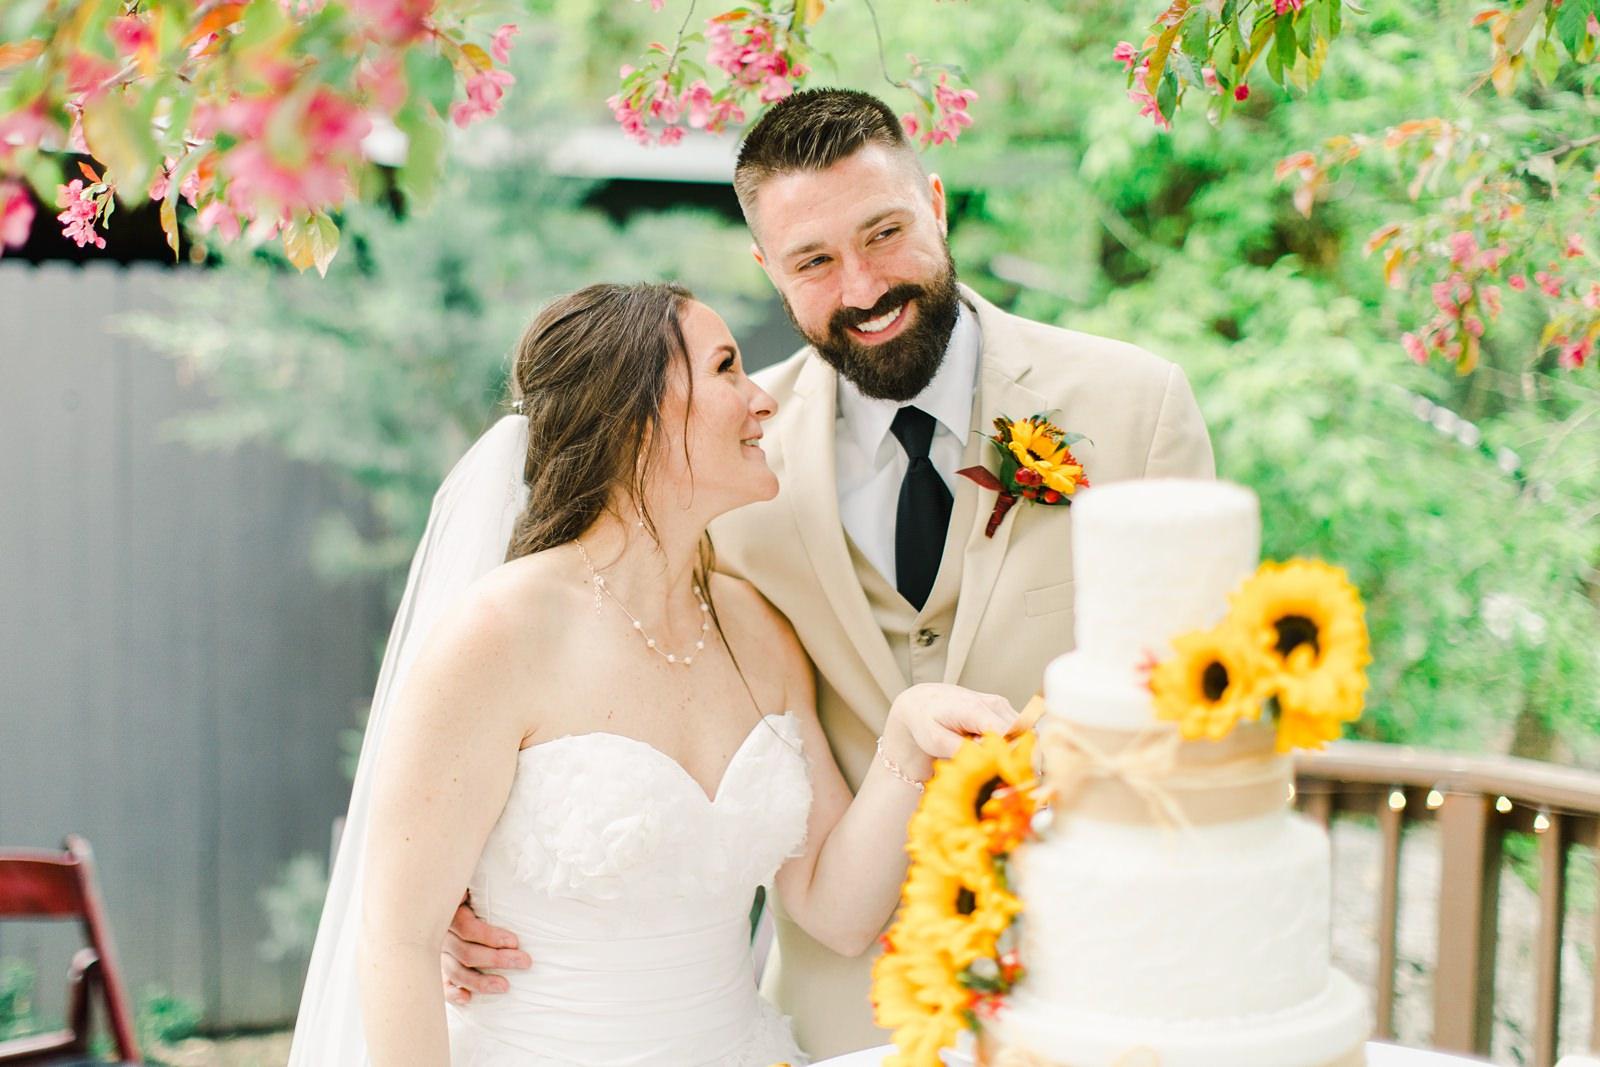 Rustic Summer Wedding Full of Sunflowers at Millcreek Inn | Salt Lake City, Utah